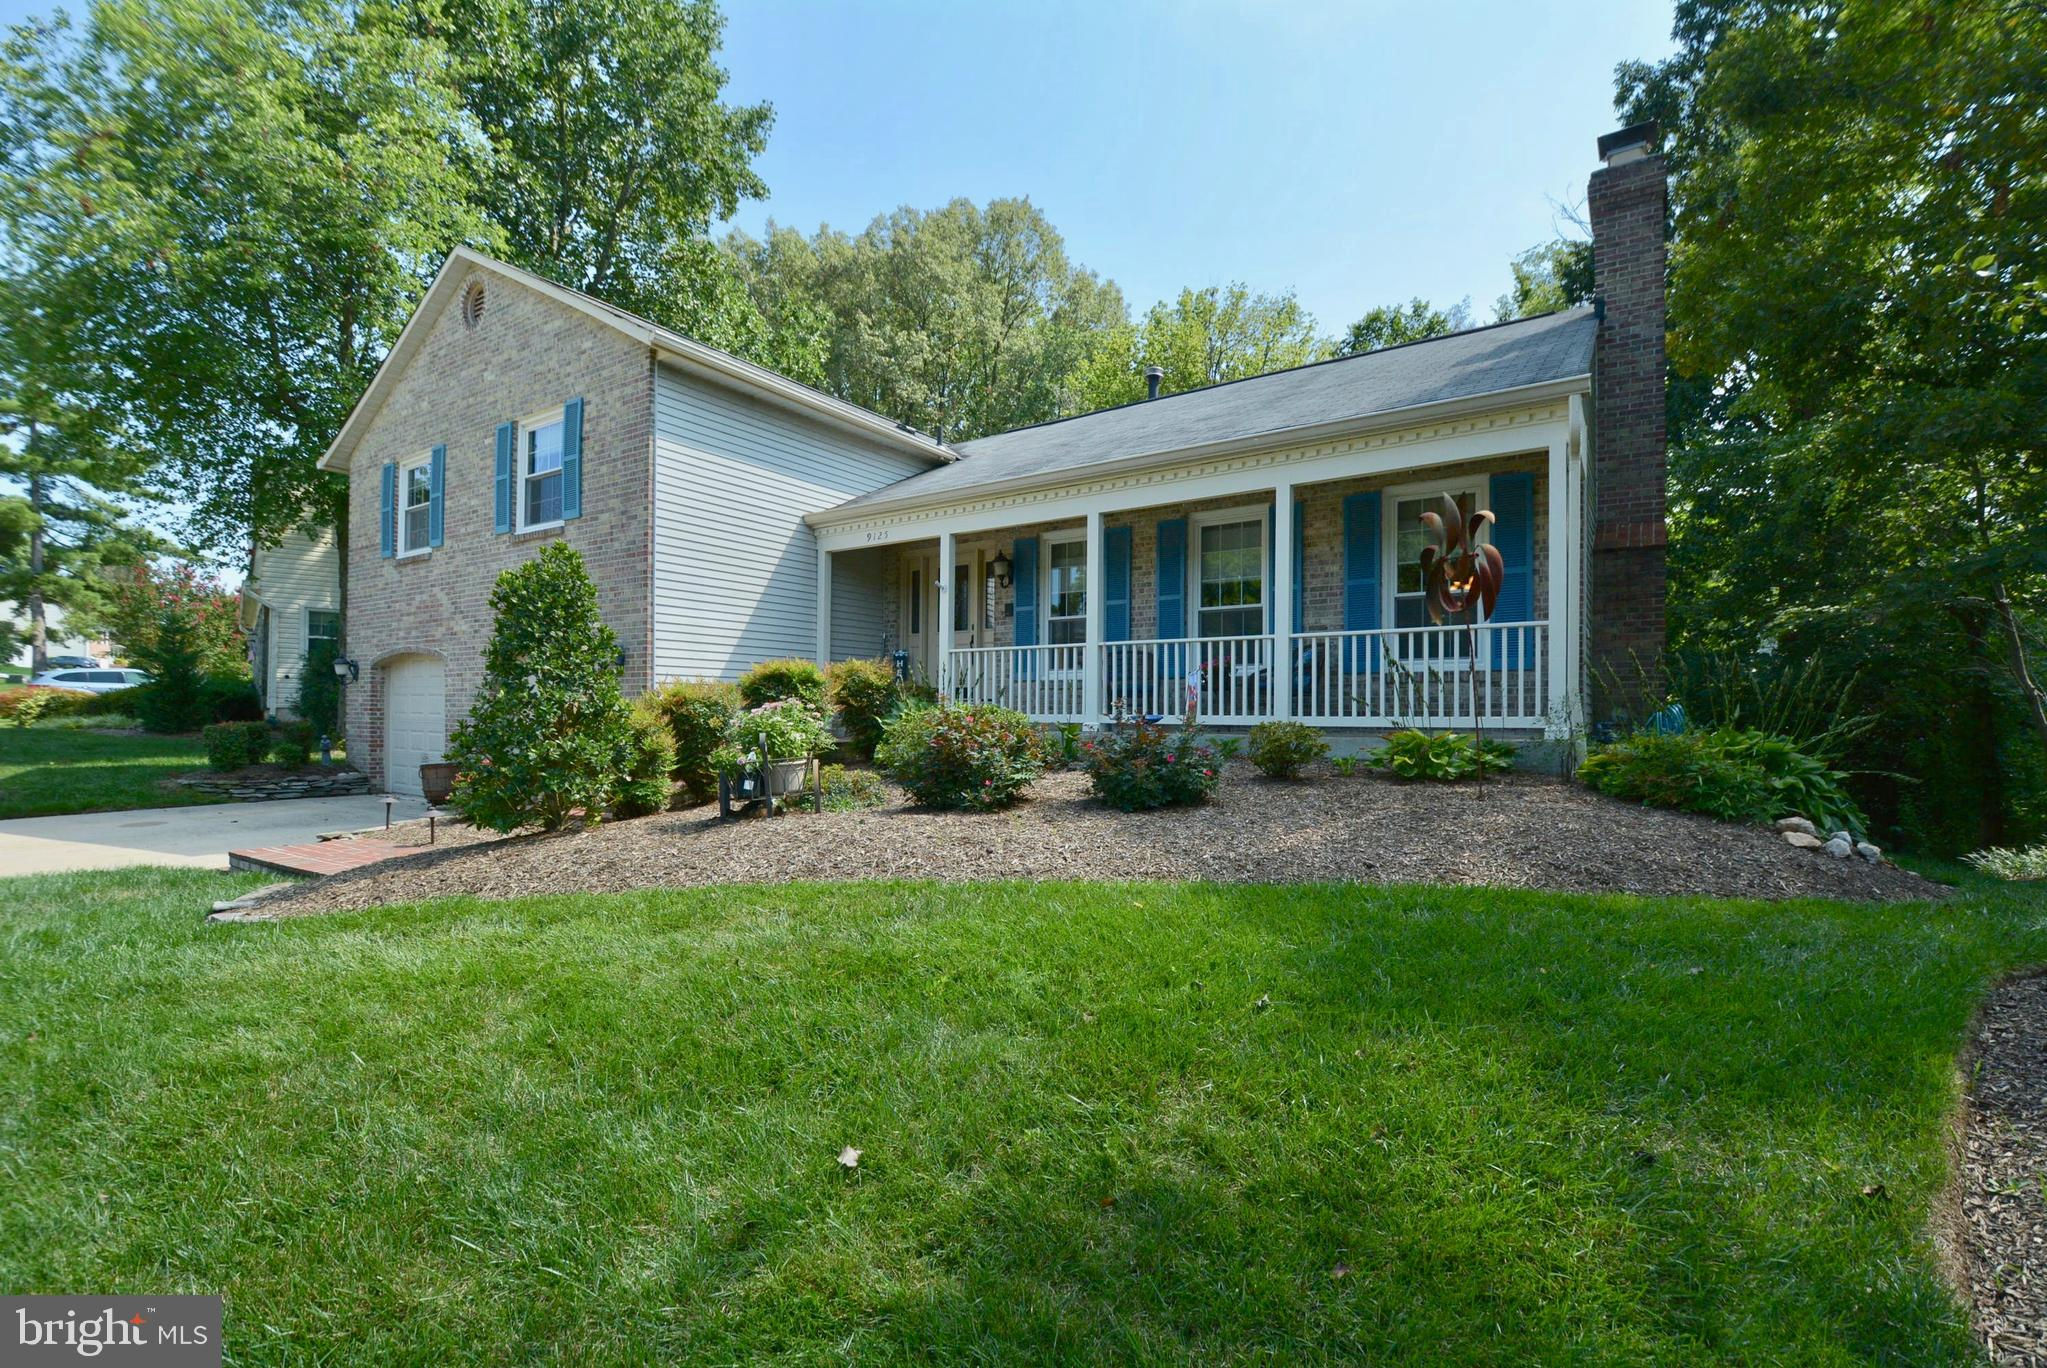 9125 Lake Braddock Drive, Burke, VA 22015 now has a new price of $774,990!